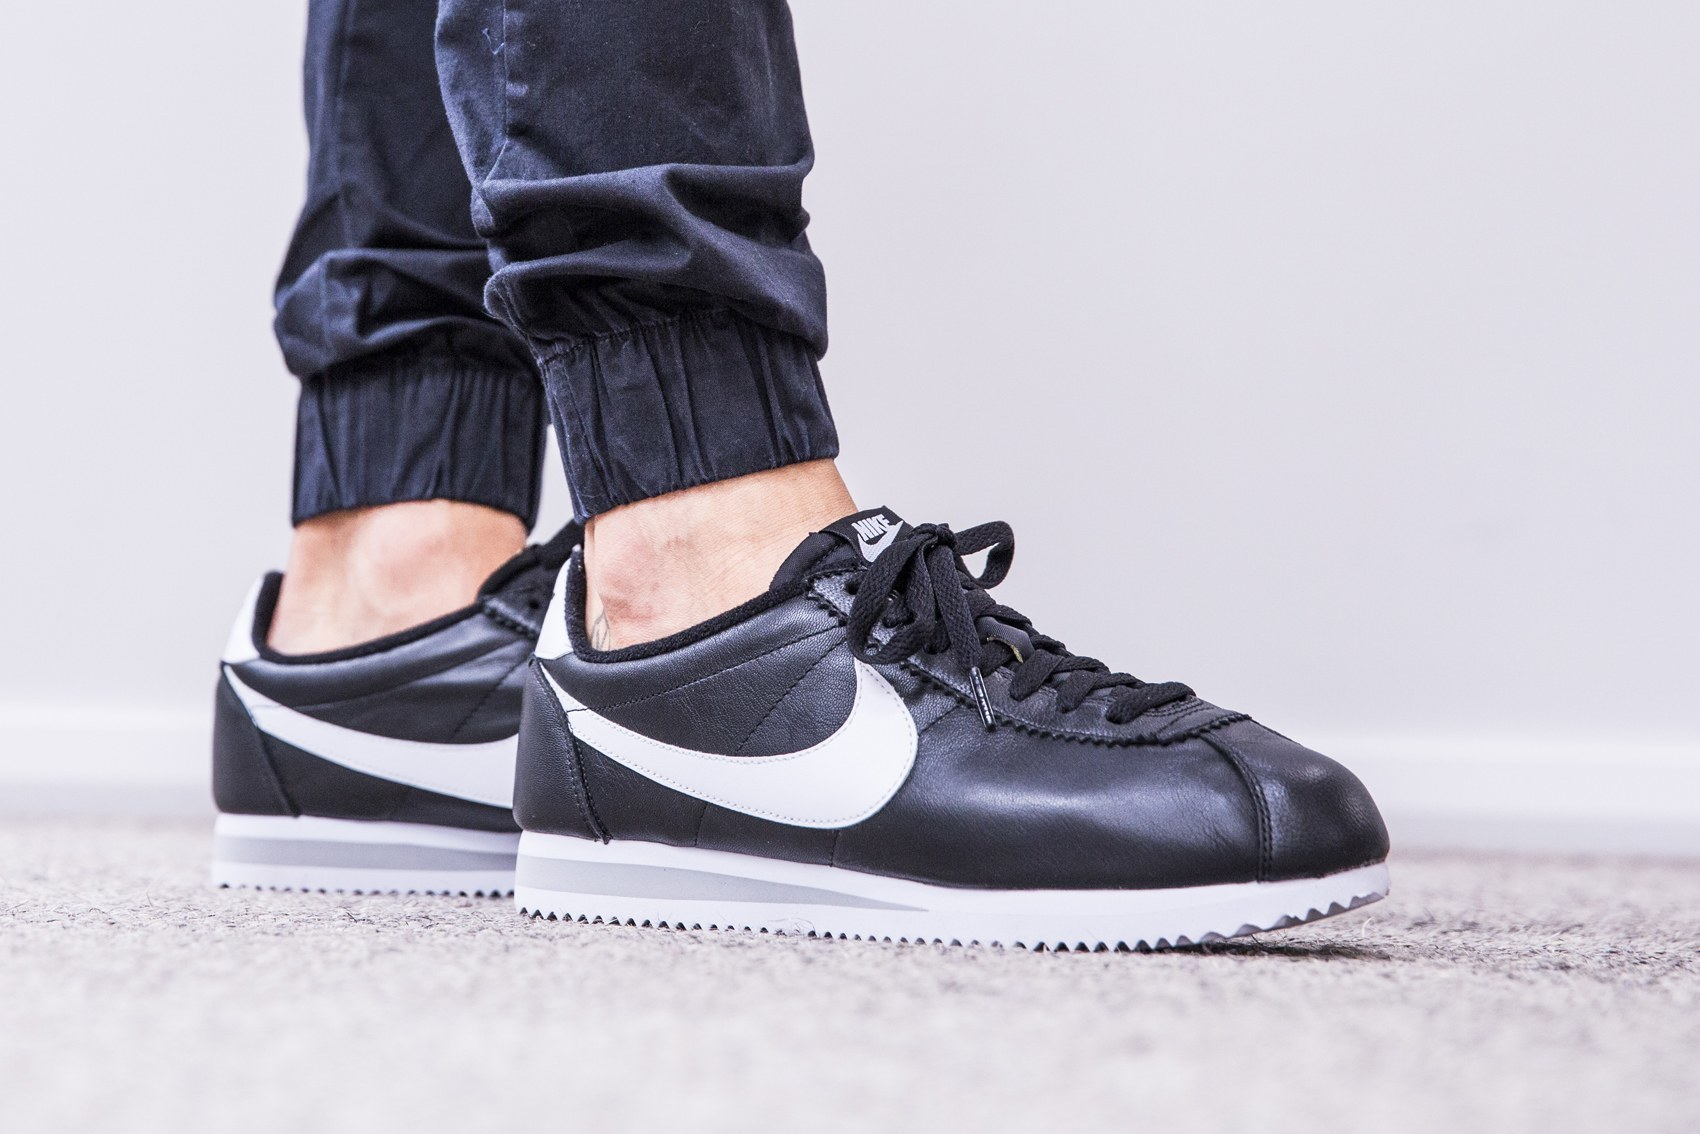 Womens Nike Cortez Black Leather